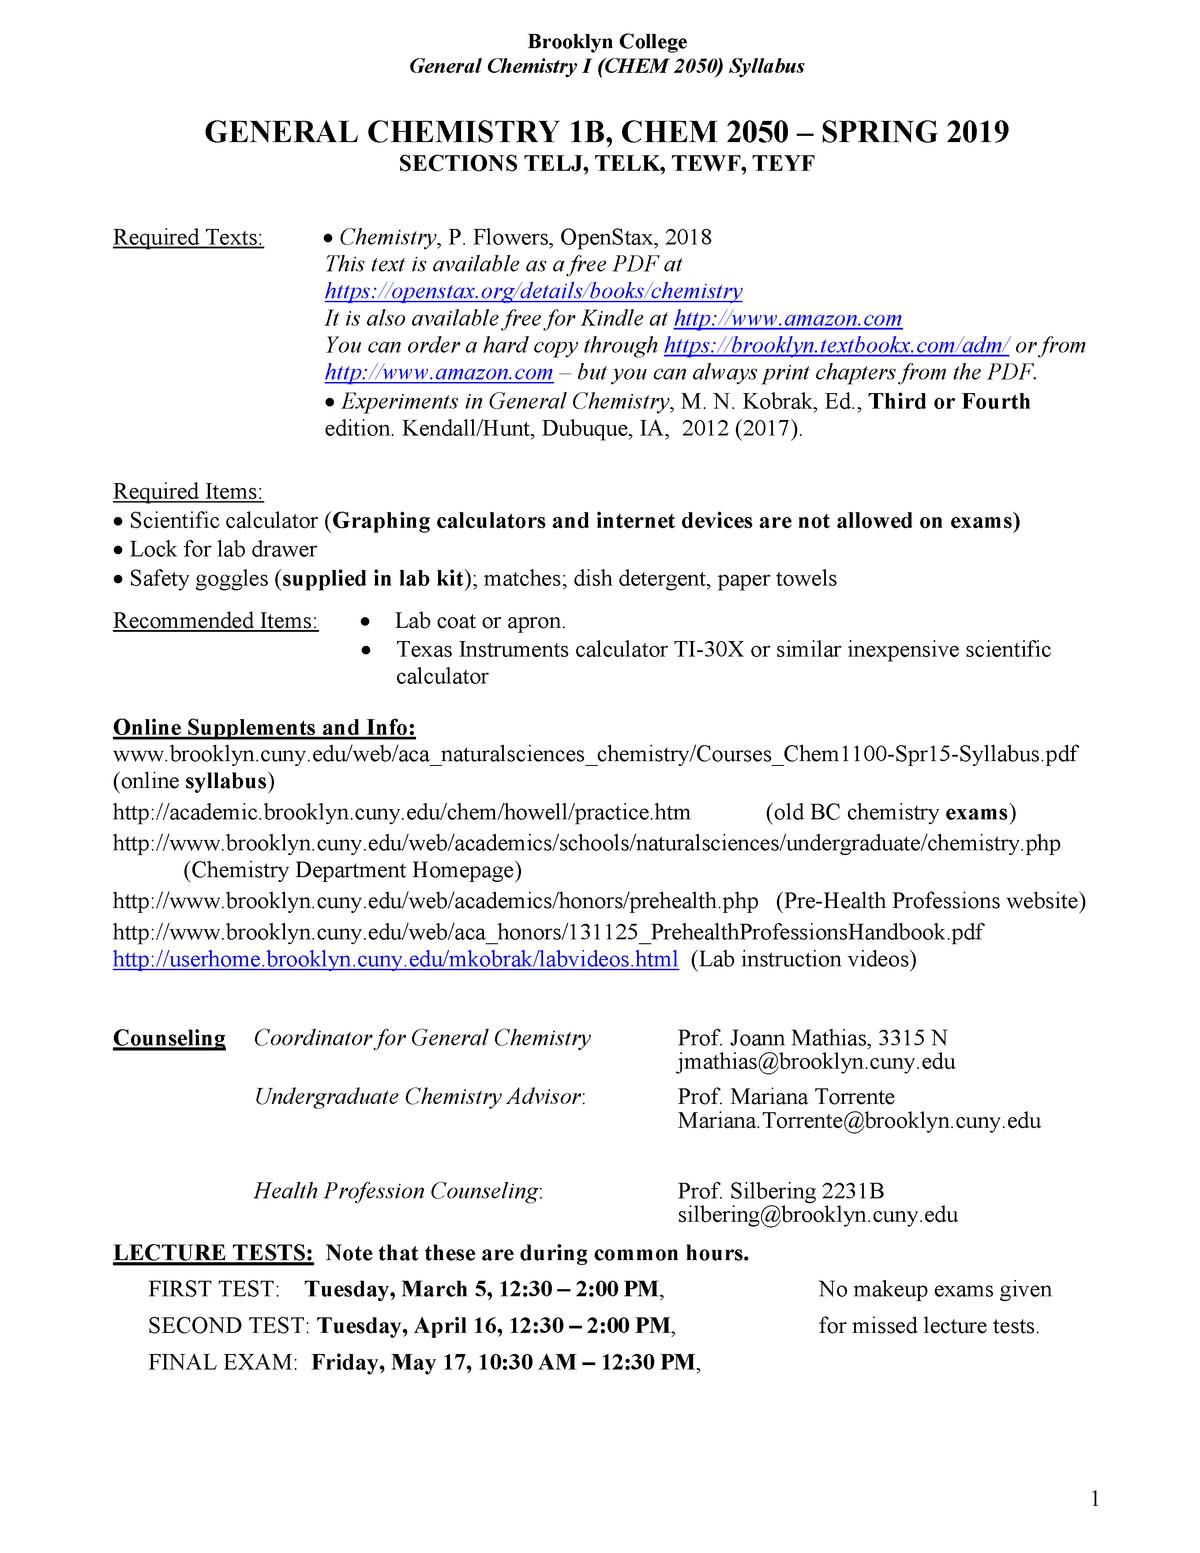 Brooklyn College Attachment 1 - CHEM 1100: General Chemistry